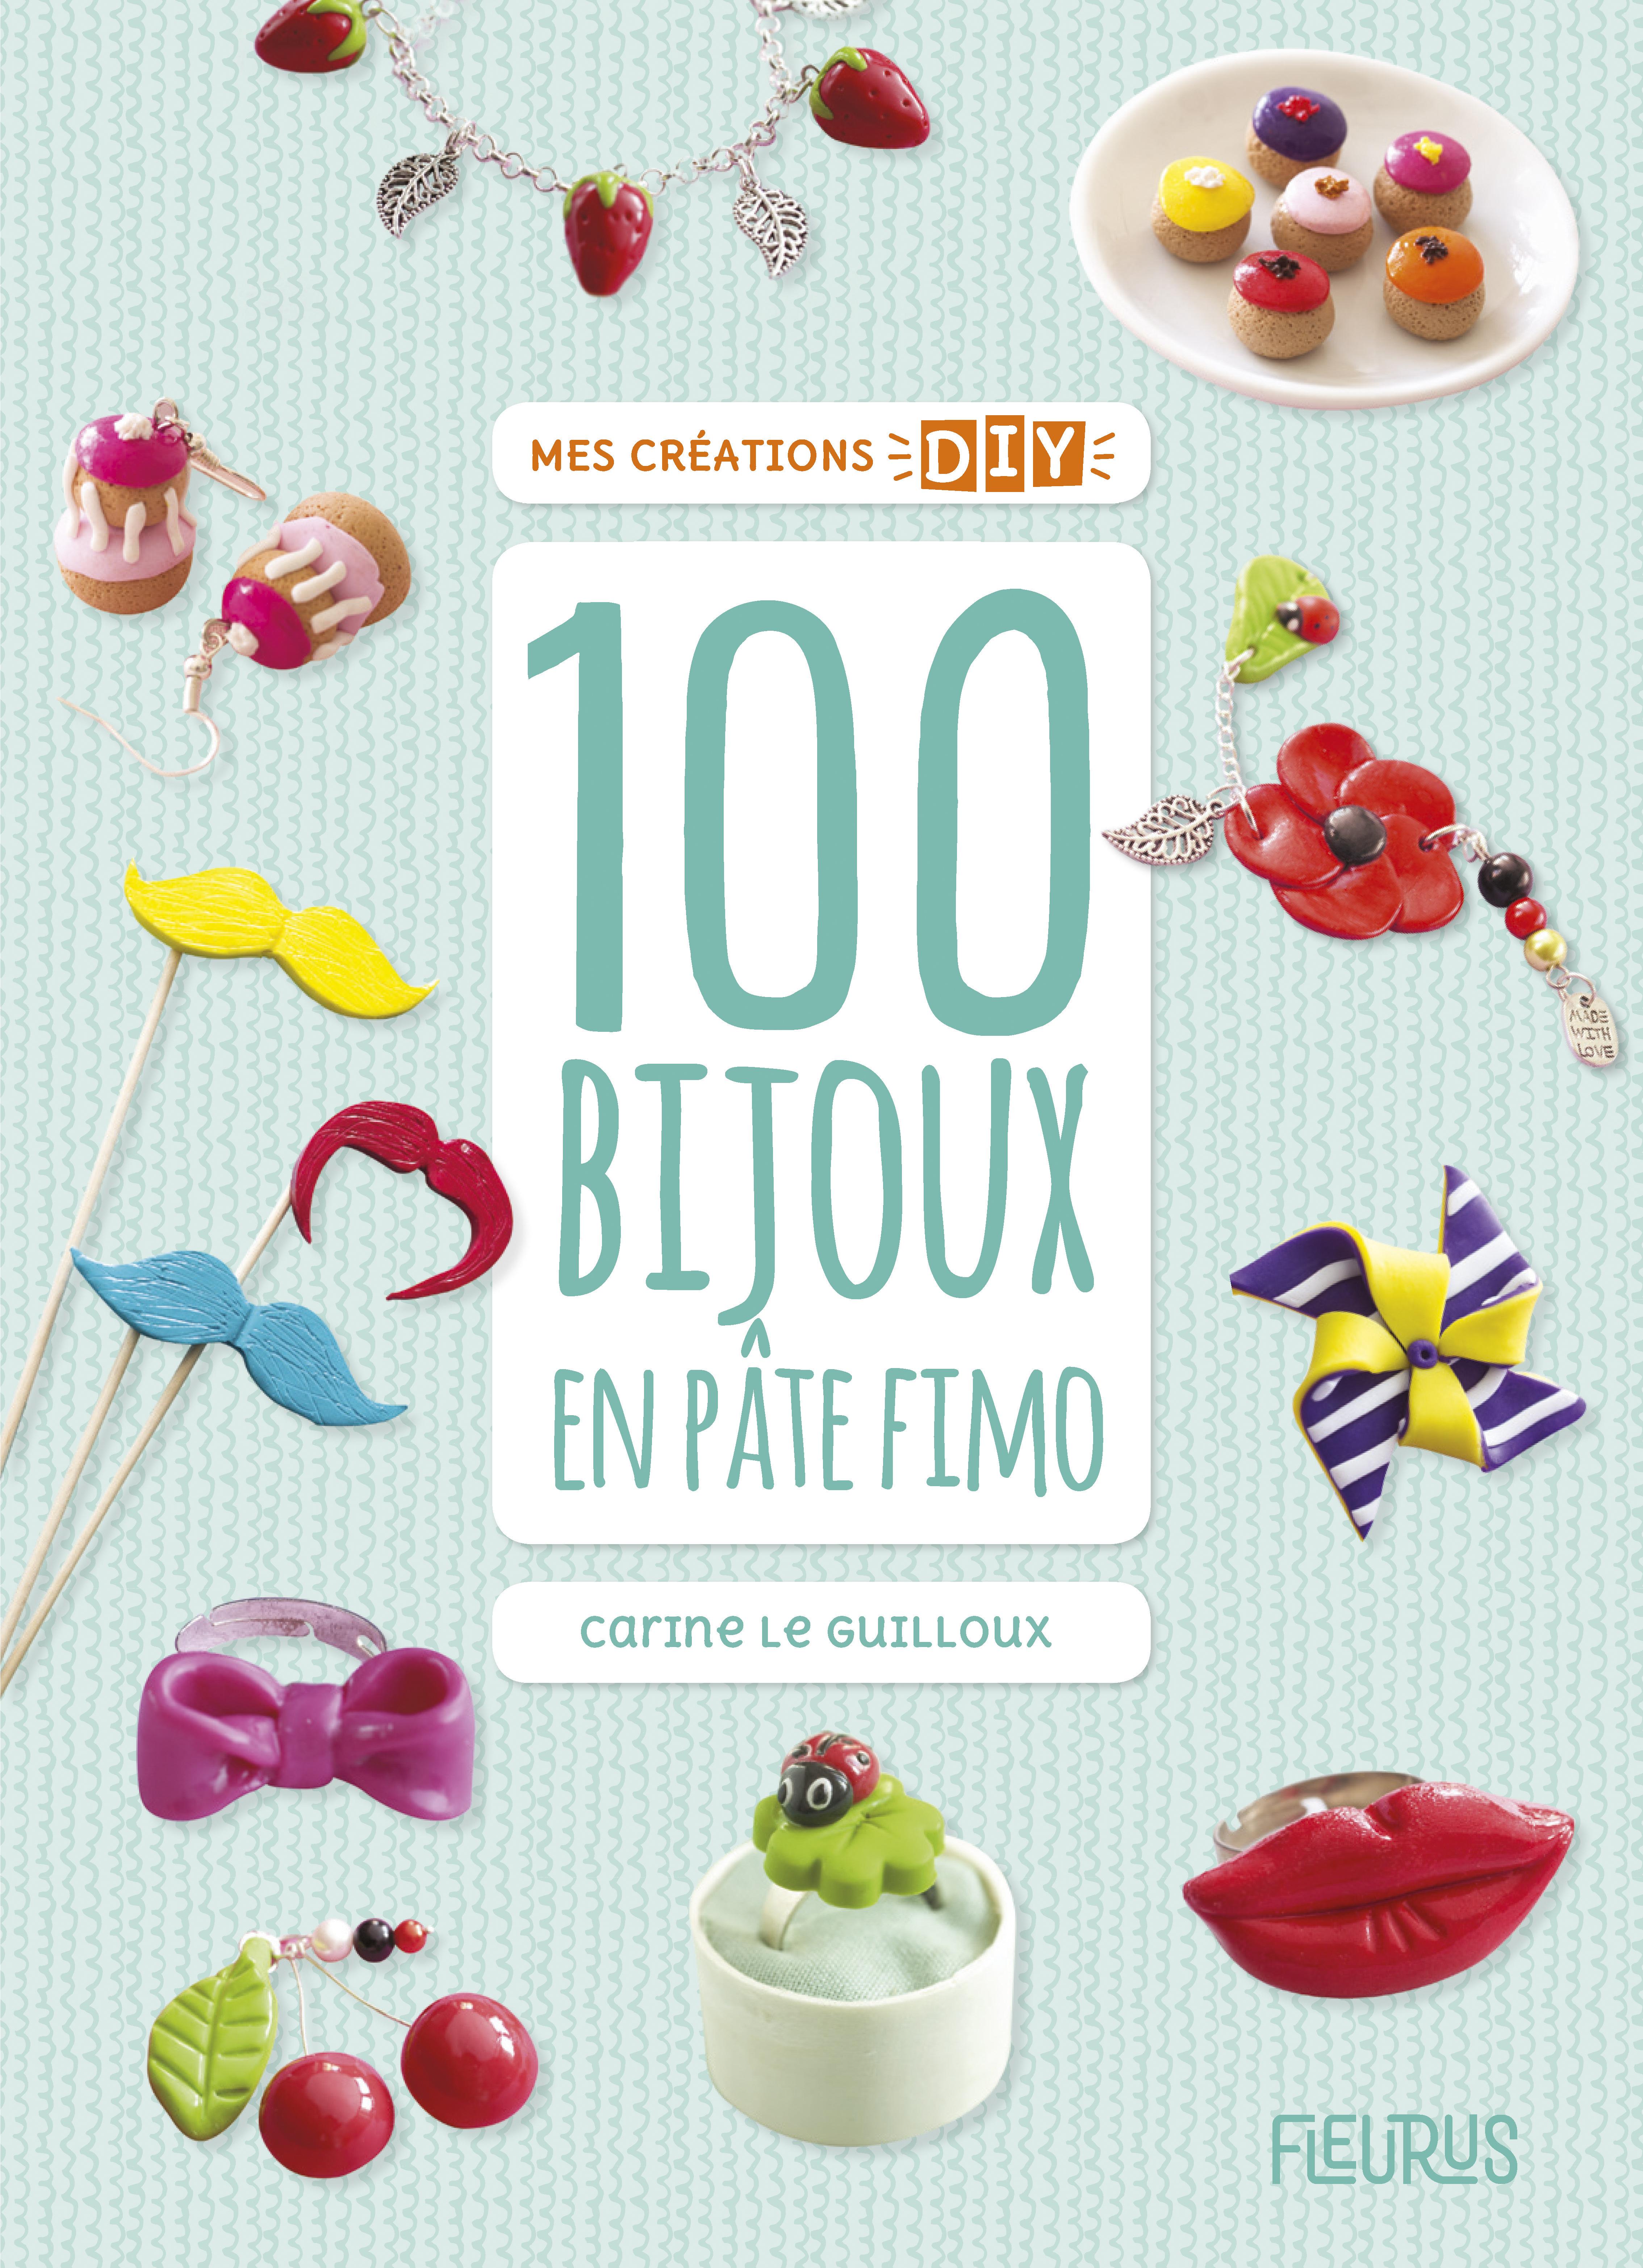 100 BIJOUX EN PATE FIMO